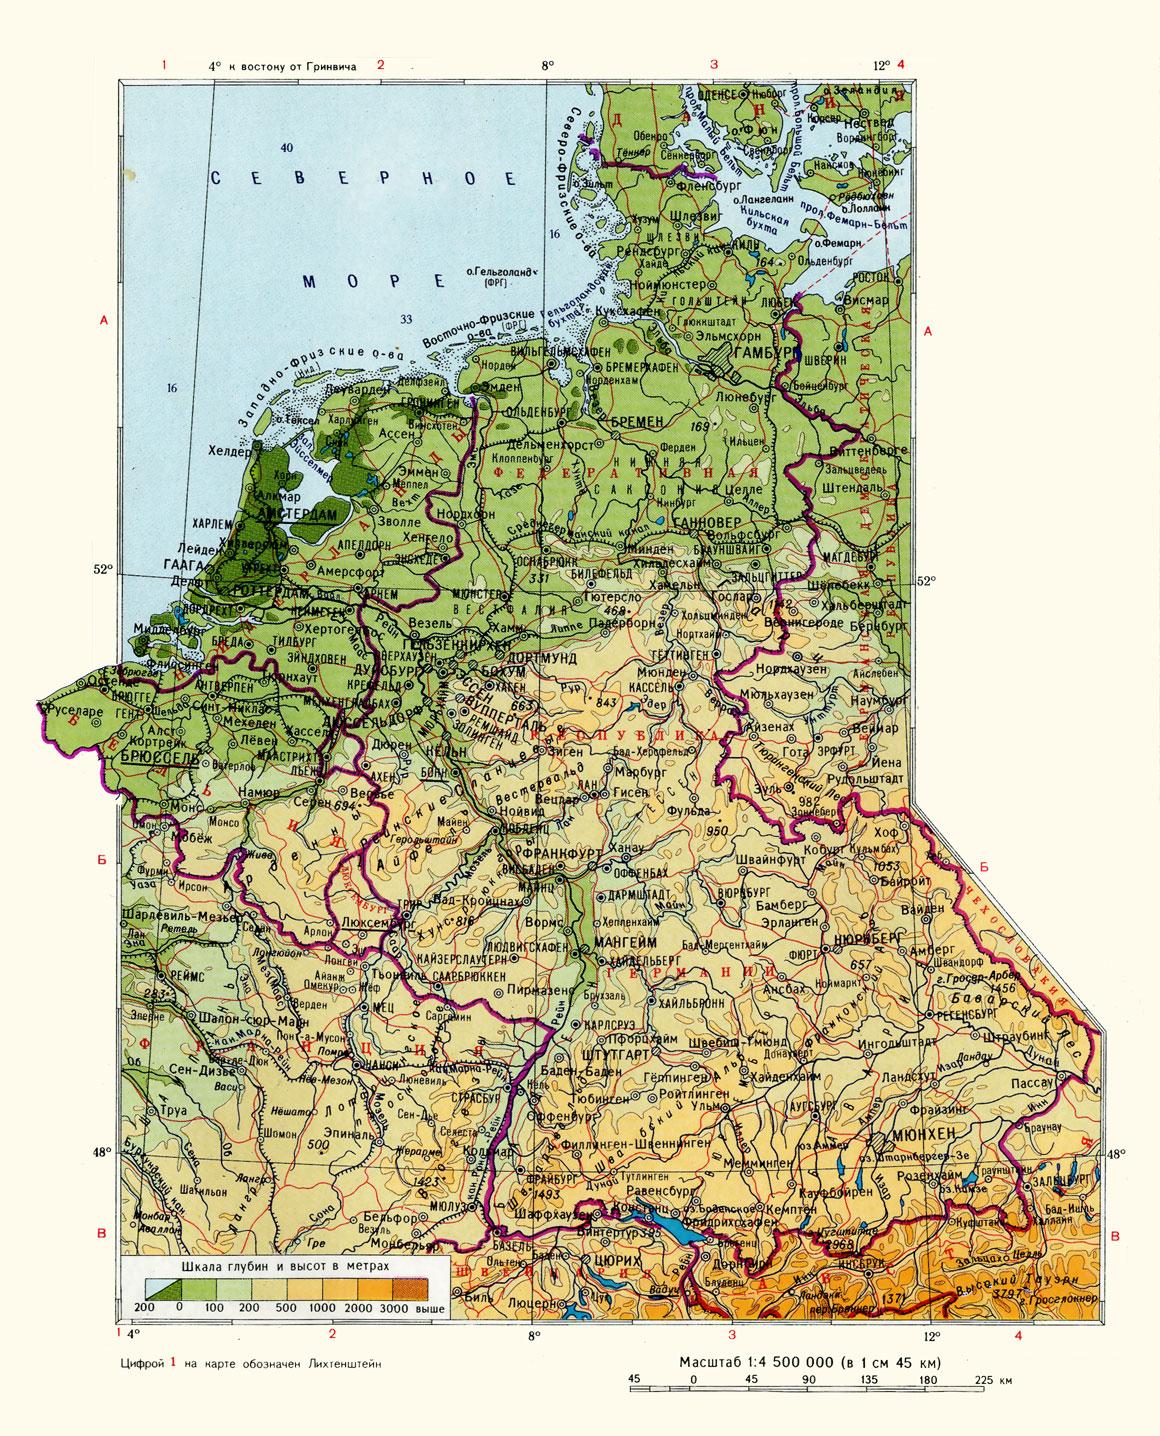 Фрг нидерланды бельгия люксембург